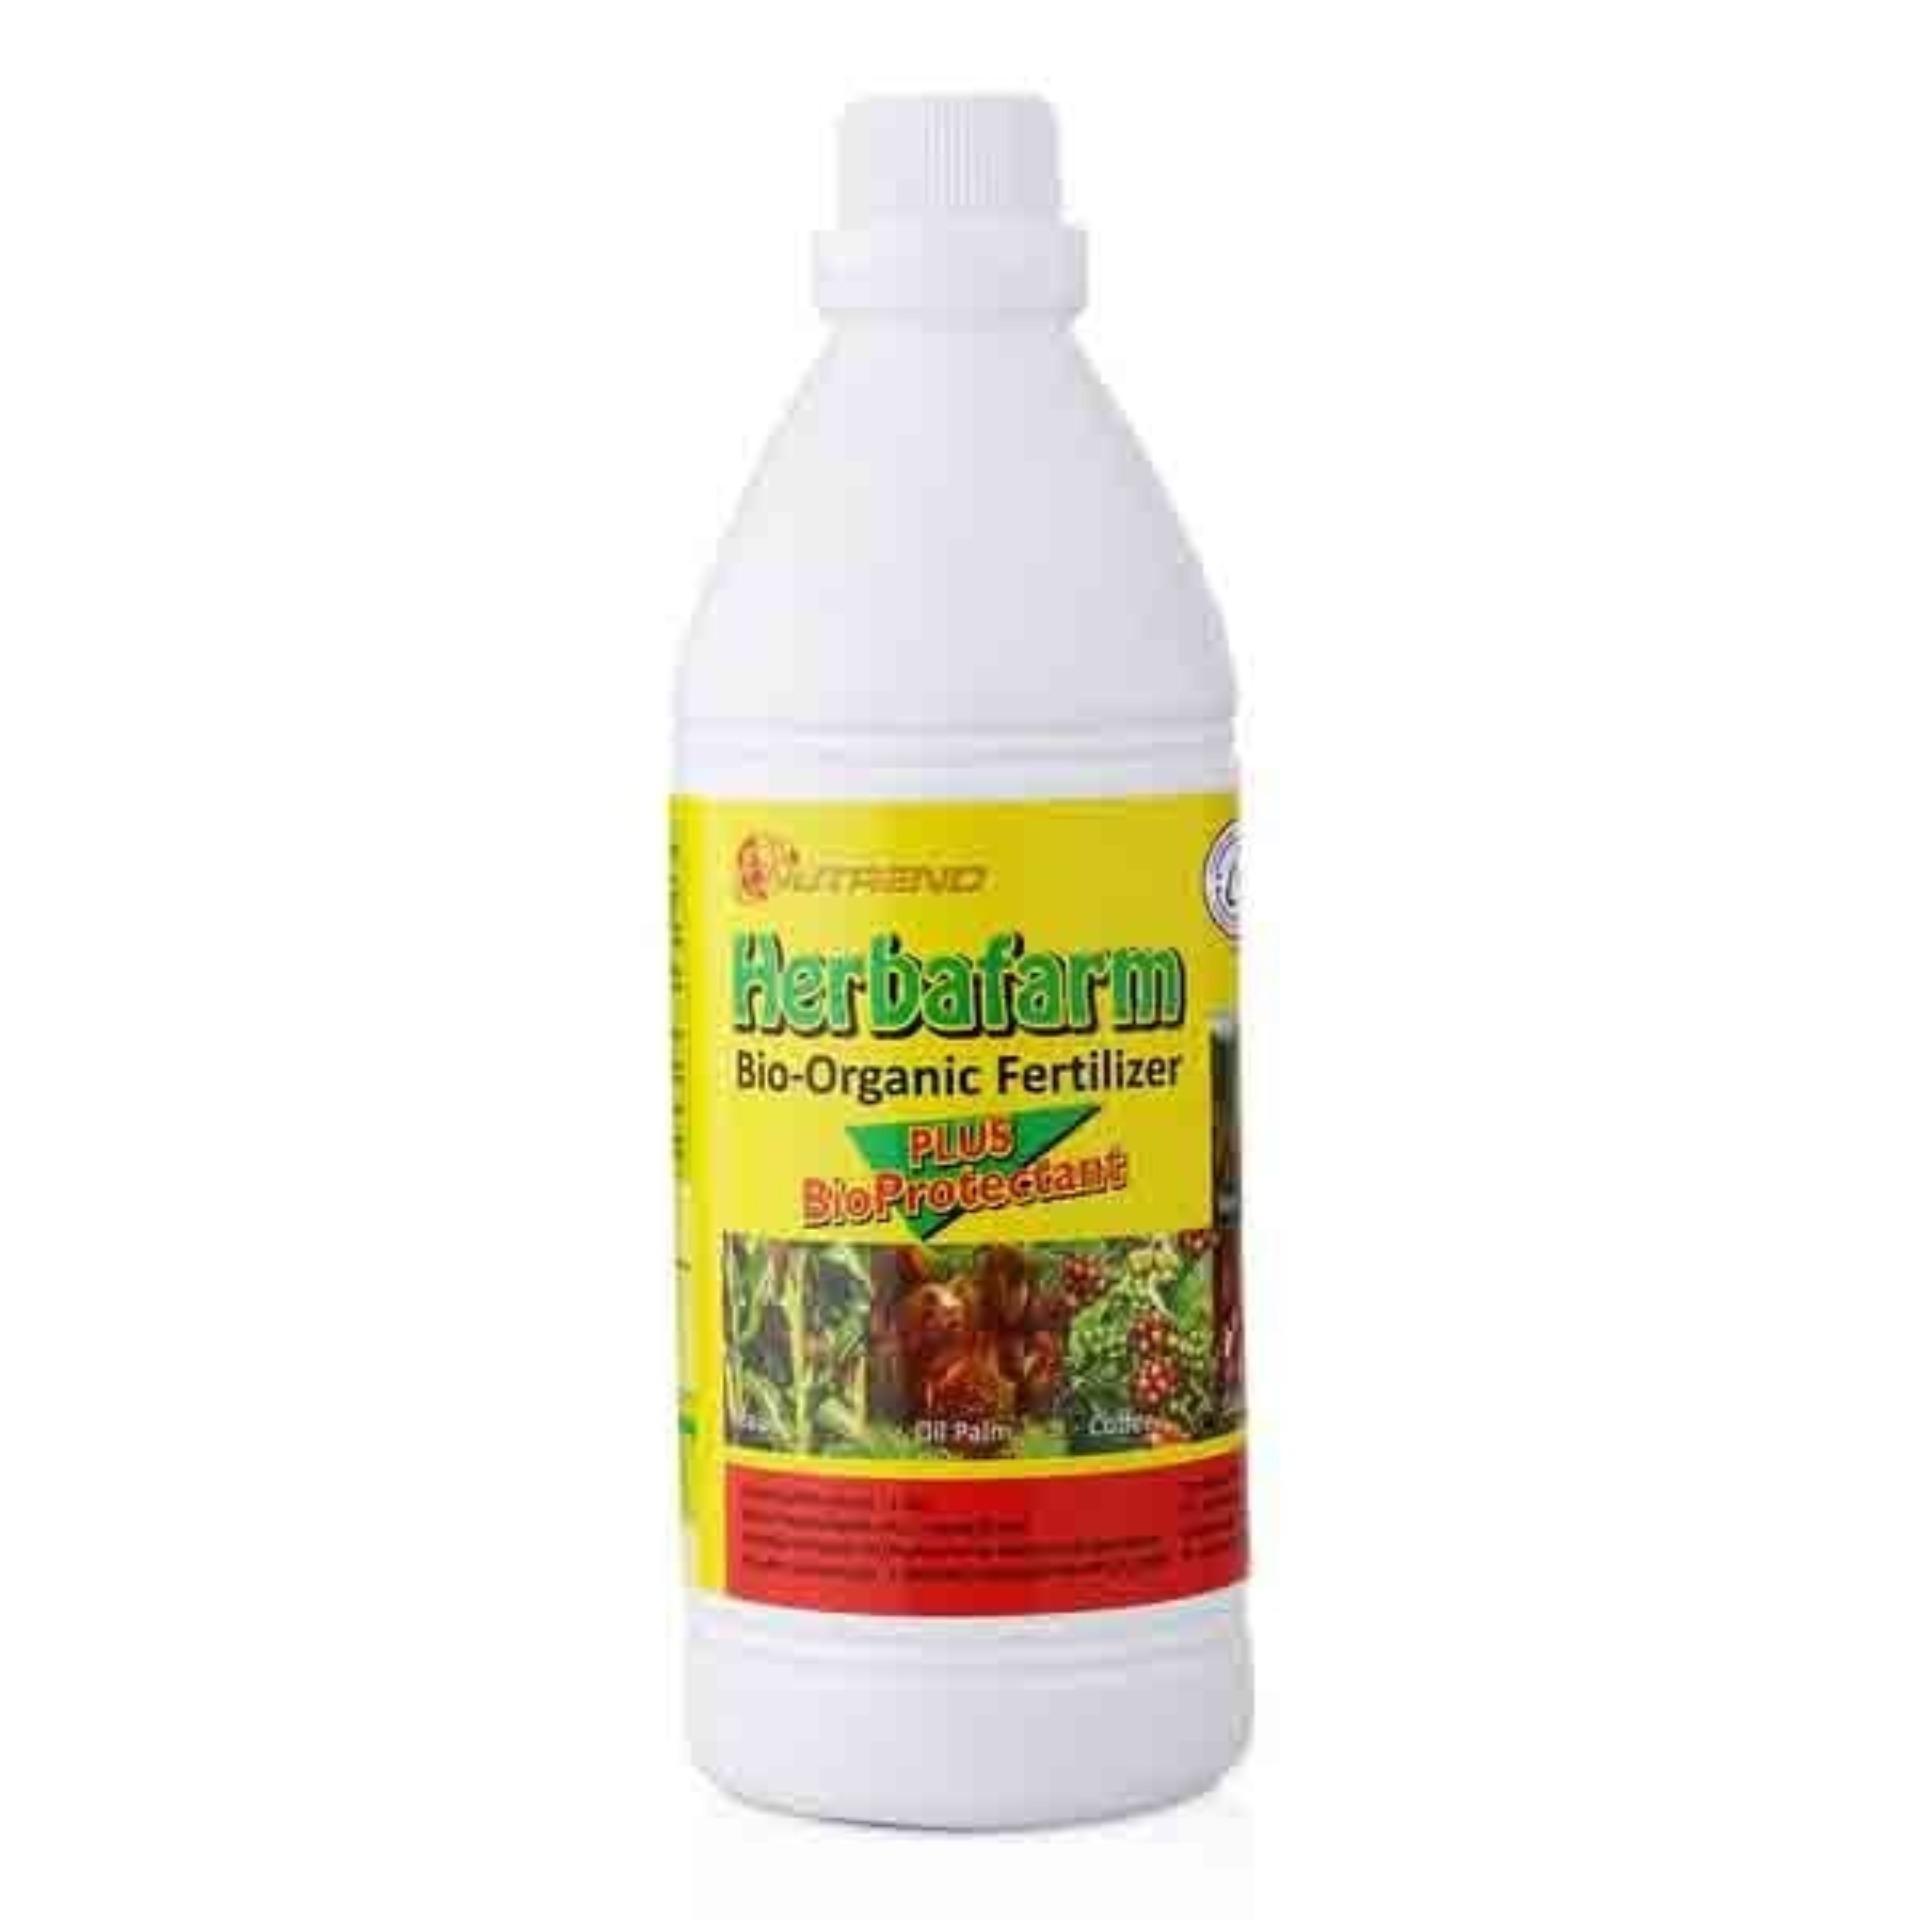 Herbafarm Pupuk Cair Bio Organik 1 Lt Nutrend Diskon 50